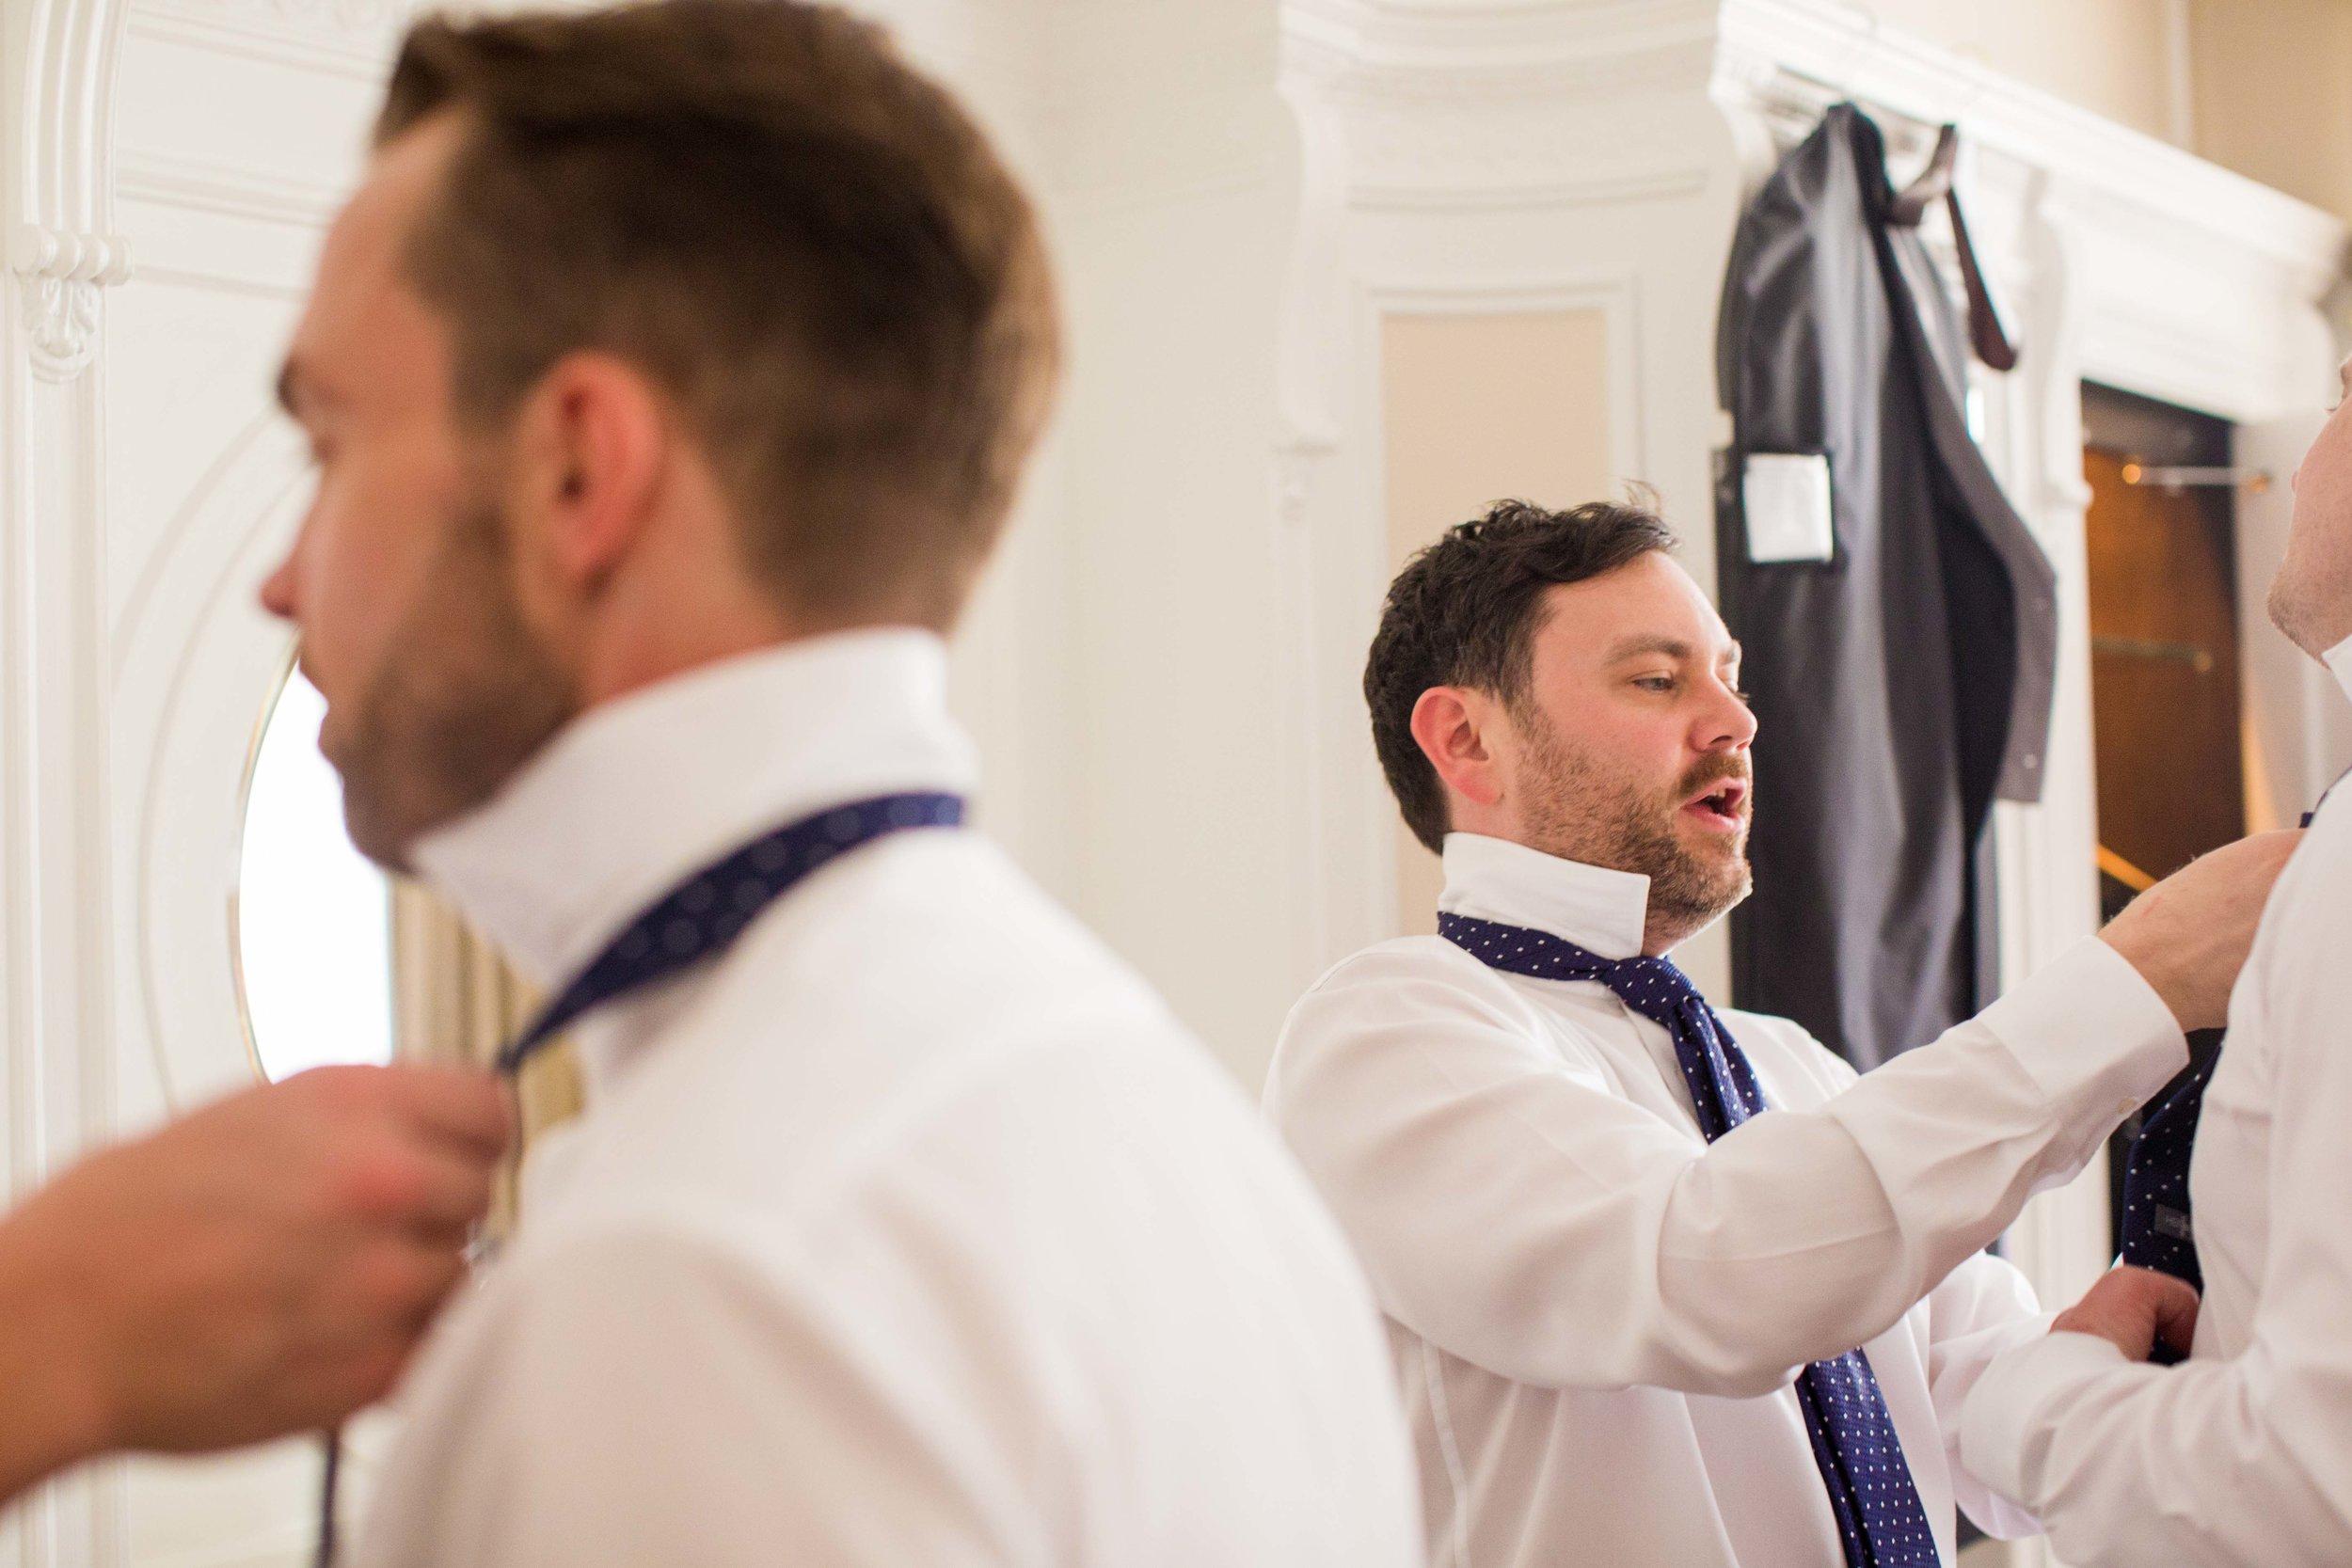 claridges-hotel-wedding-photographer-london-mayfair-natalia-smith-photography-25.jpg